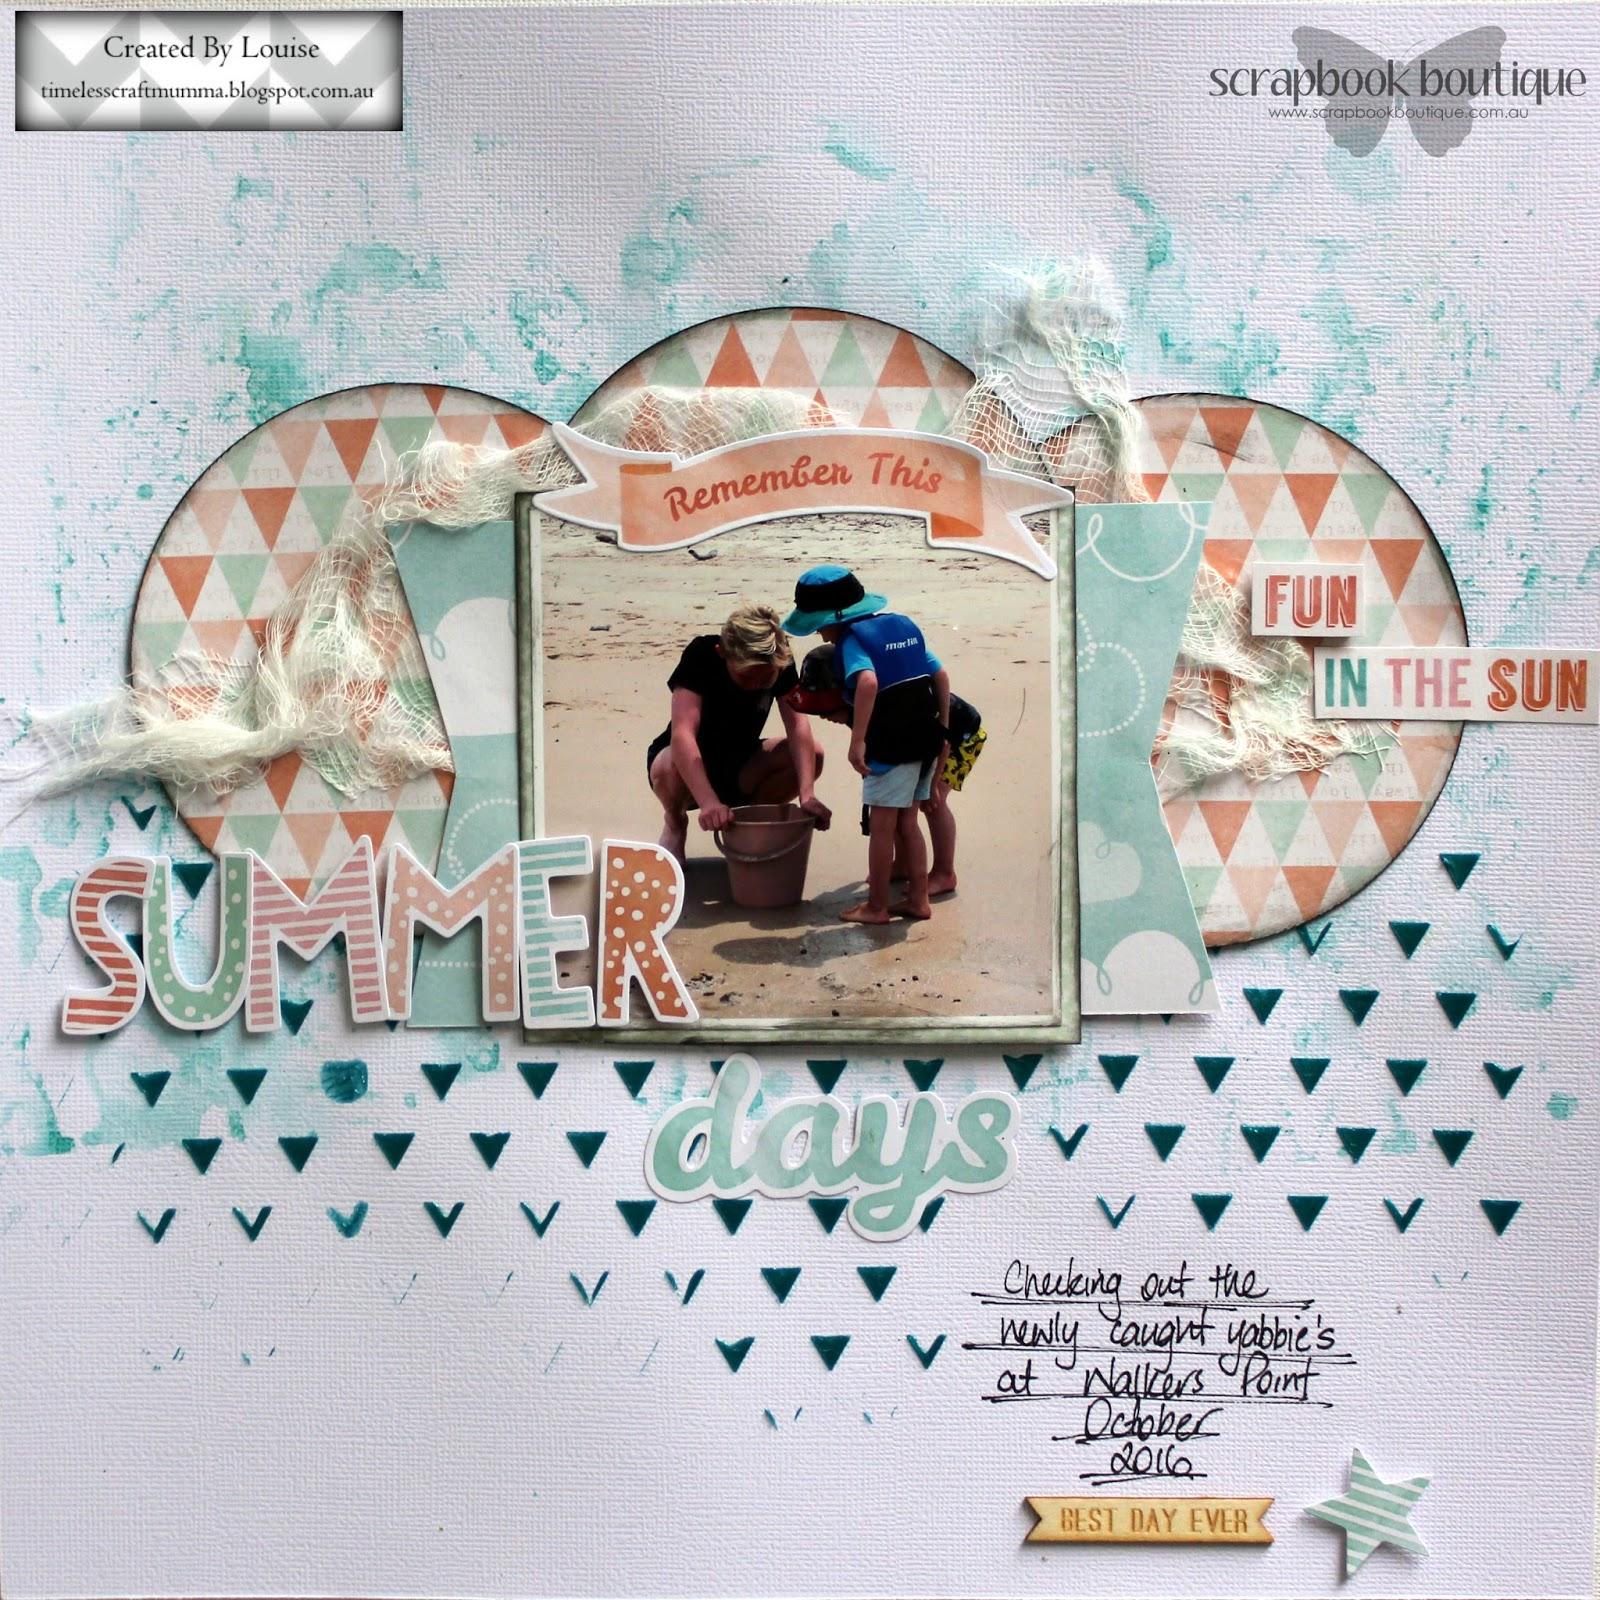 How to delete scrapbook photos google+ - Scrapbook Boutique Dt Summer Days Scrapbook Layout Using Cocoa Vanilla Studio Endless Summer Collection